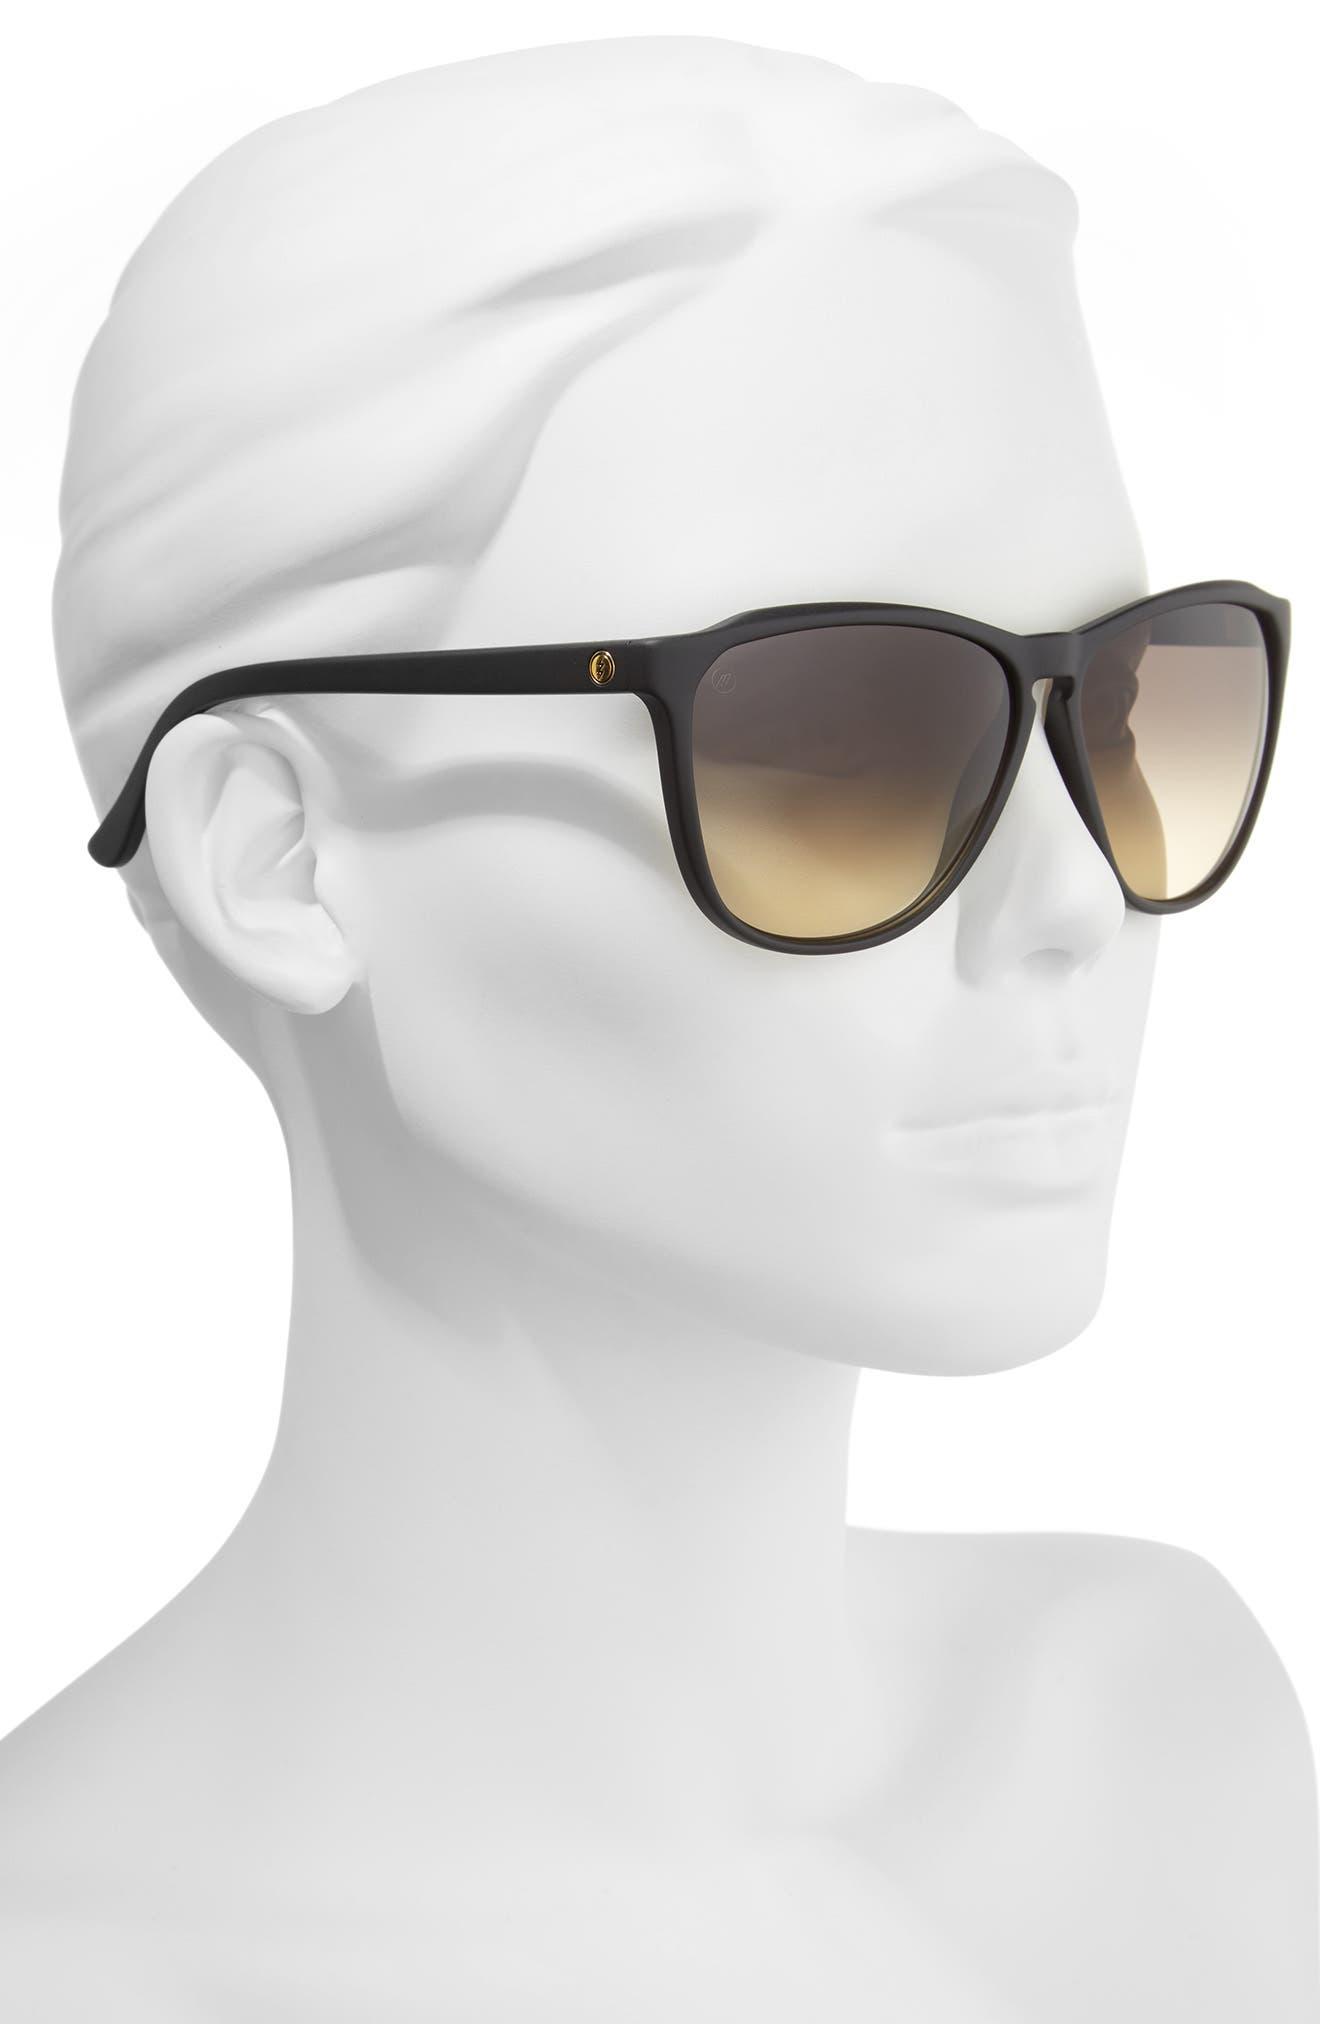 'Encelia' 66mm Retro Sunglasses,                             Alternate thumbnail 2, color,                             001